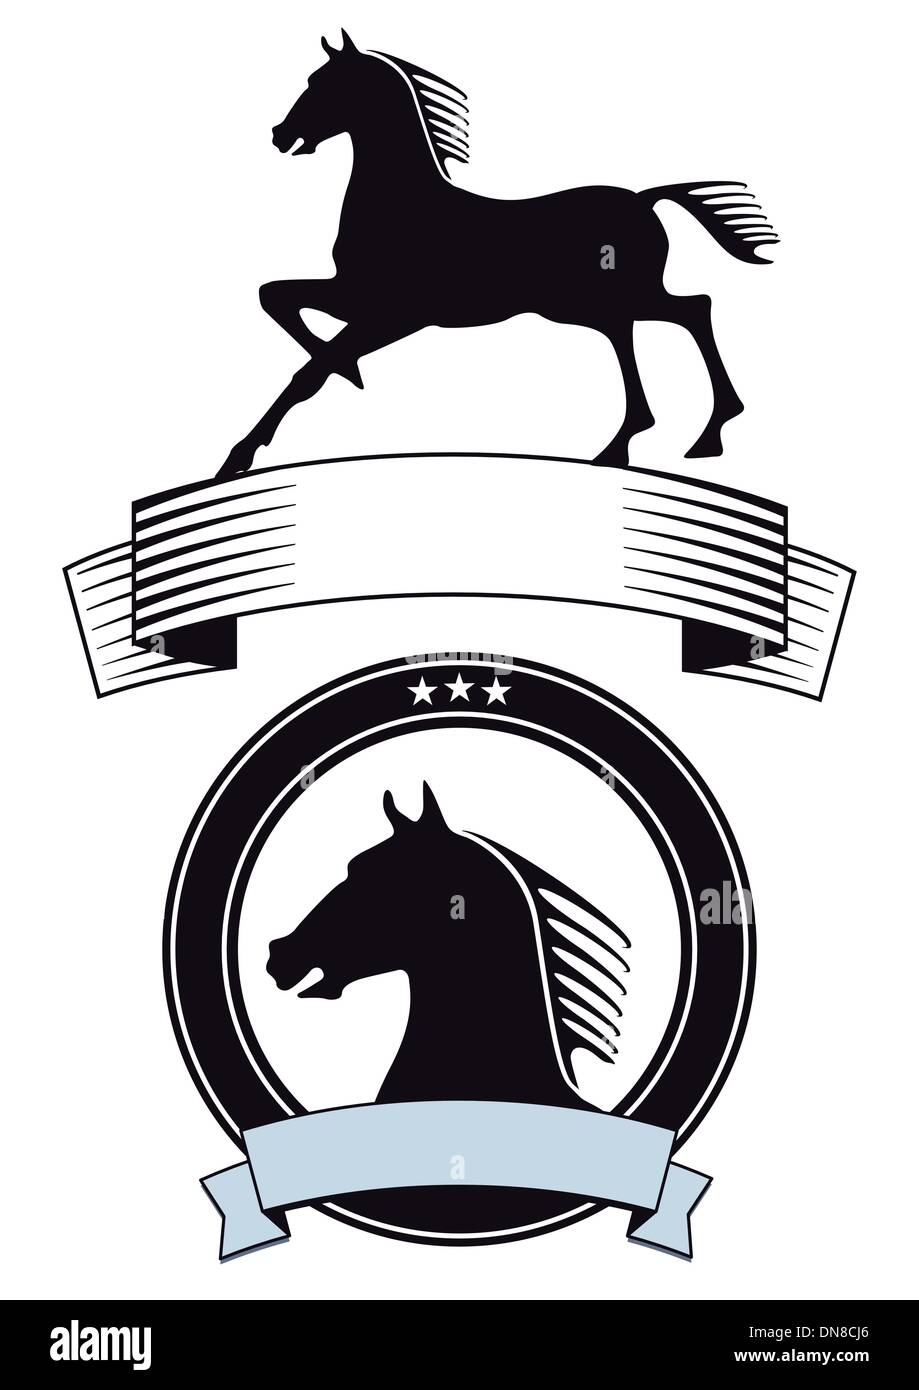 horse symbol - Stock Vector